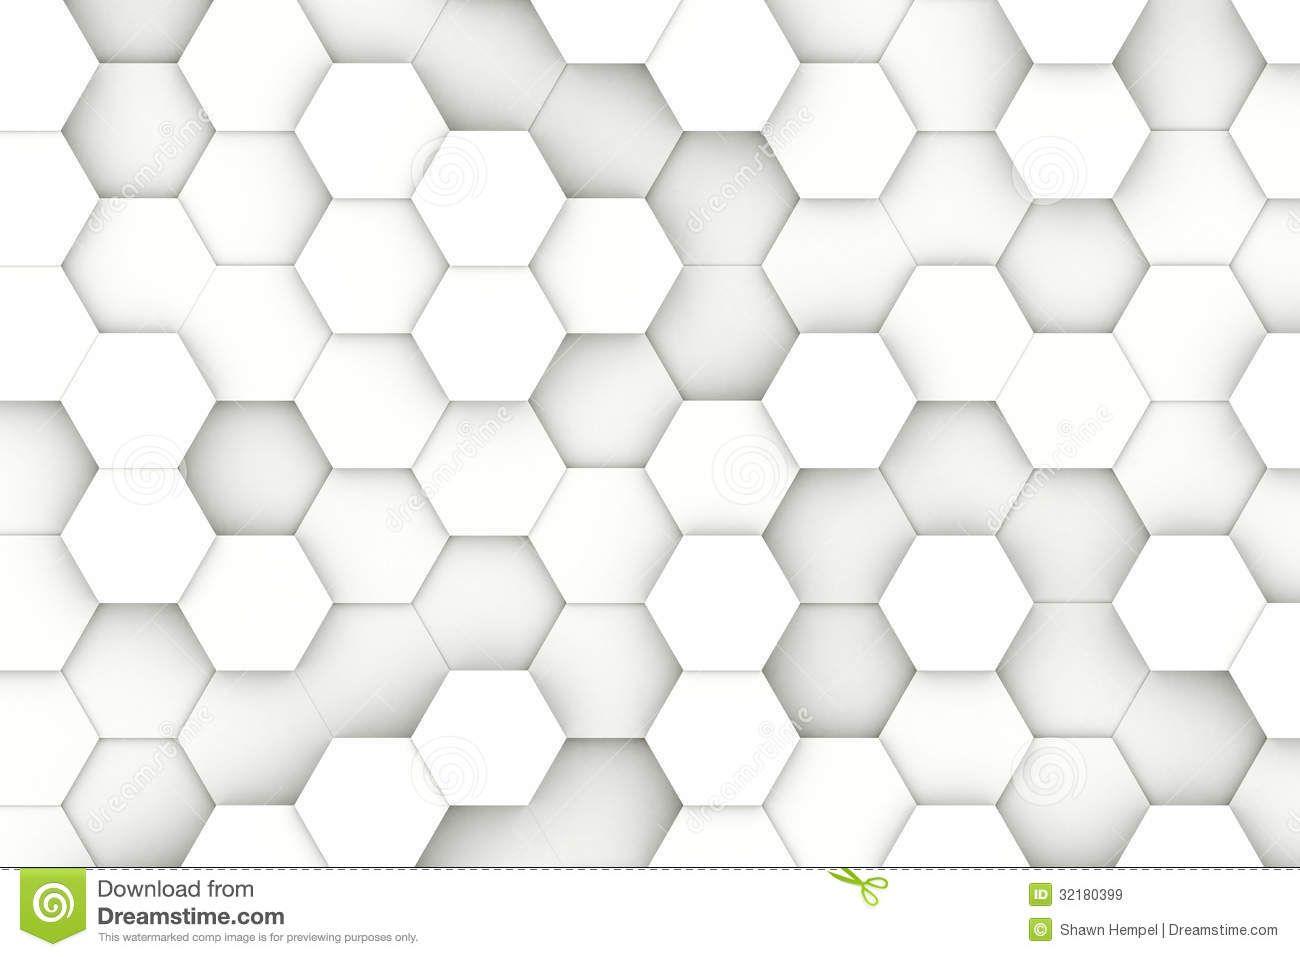 3d hexagon pattern stock vector image 54997696 - Fond Moderne D Hexagone Hexagonsstock